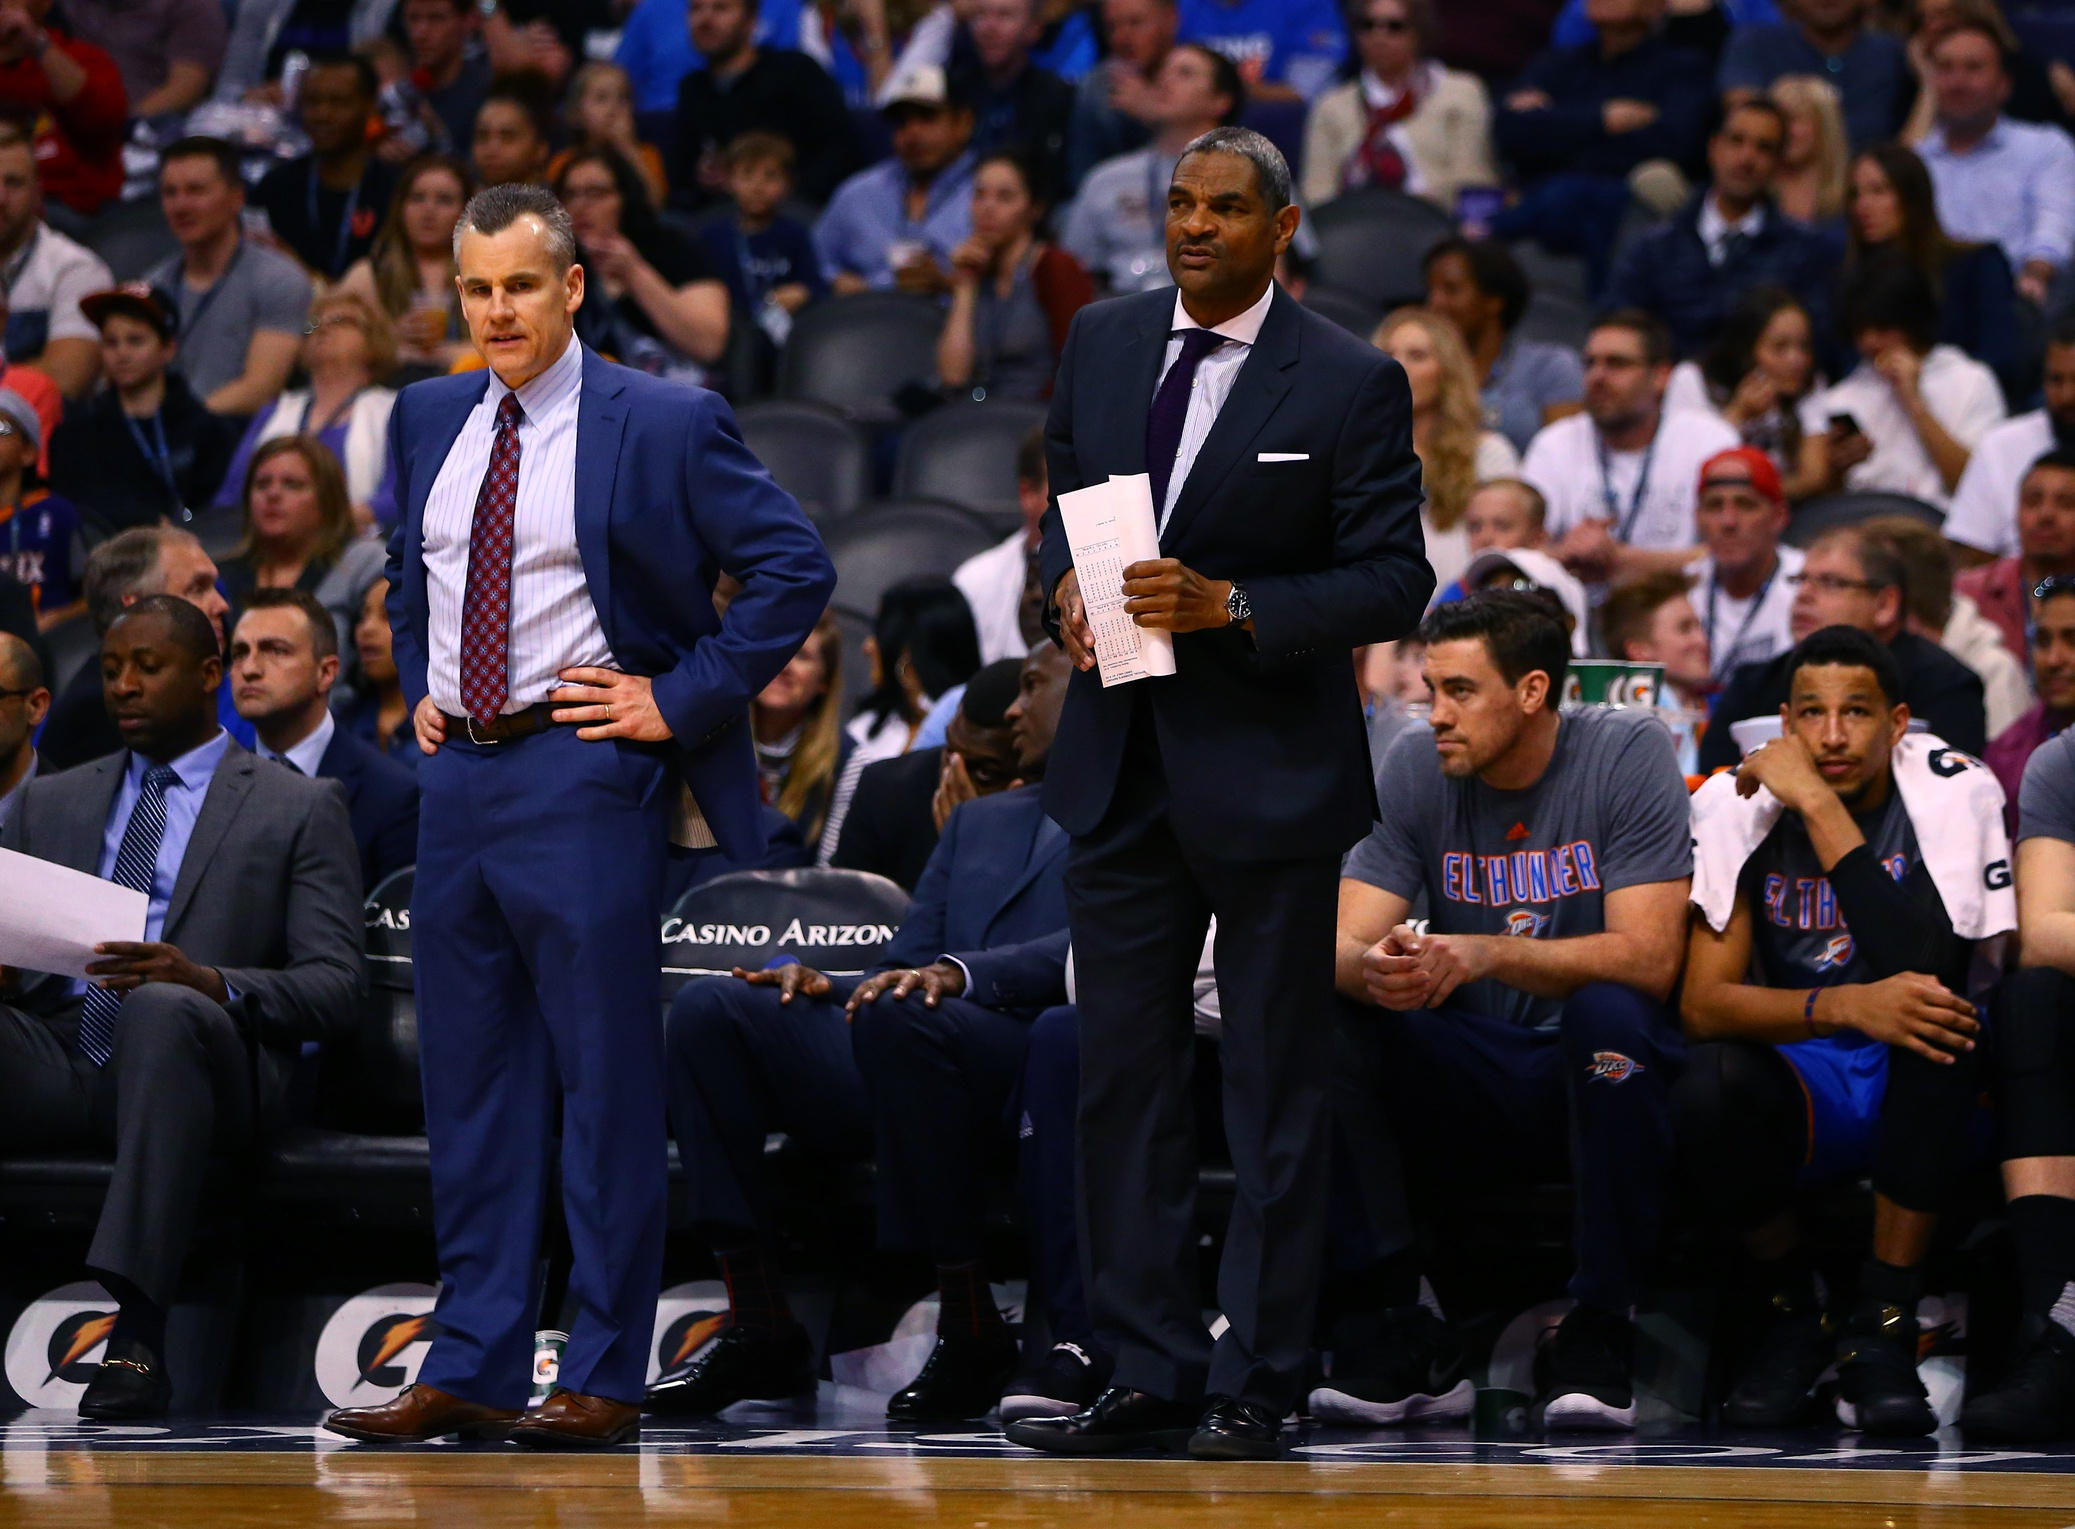 Maurice Cheeks Joins Billy Donovan's Chicago Bulls Staff